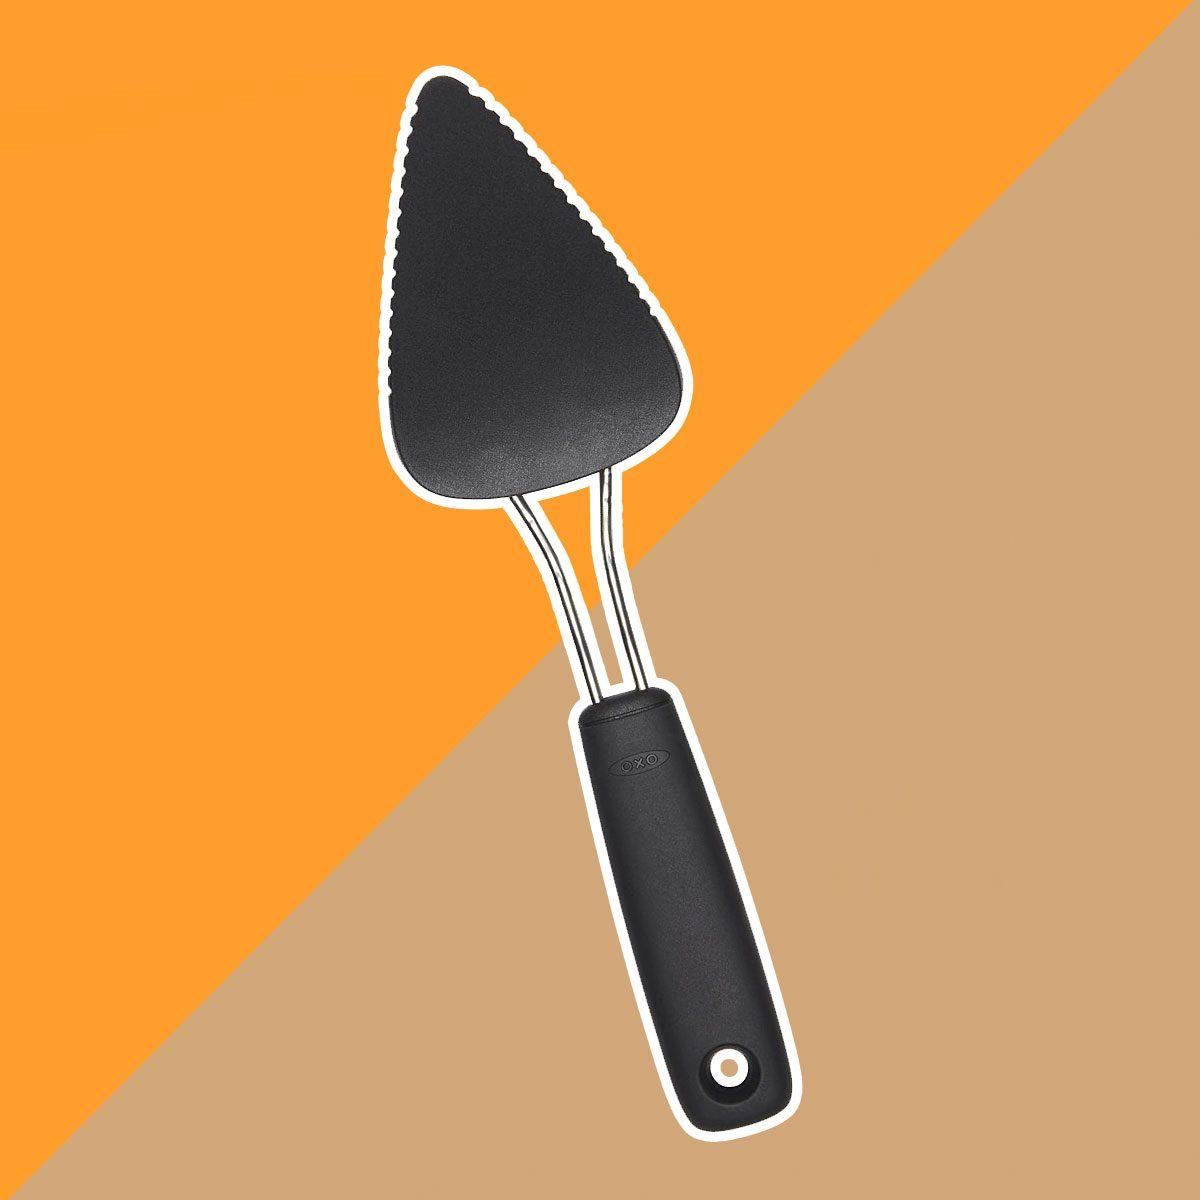 OXO Good Grips Black Nylon Flexible Pie Server